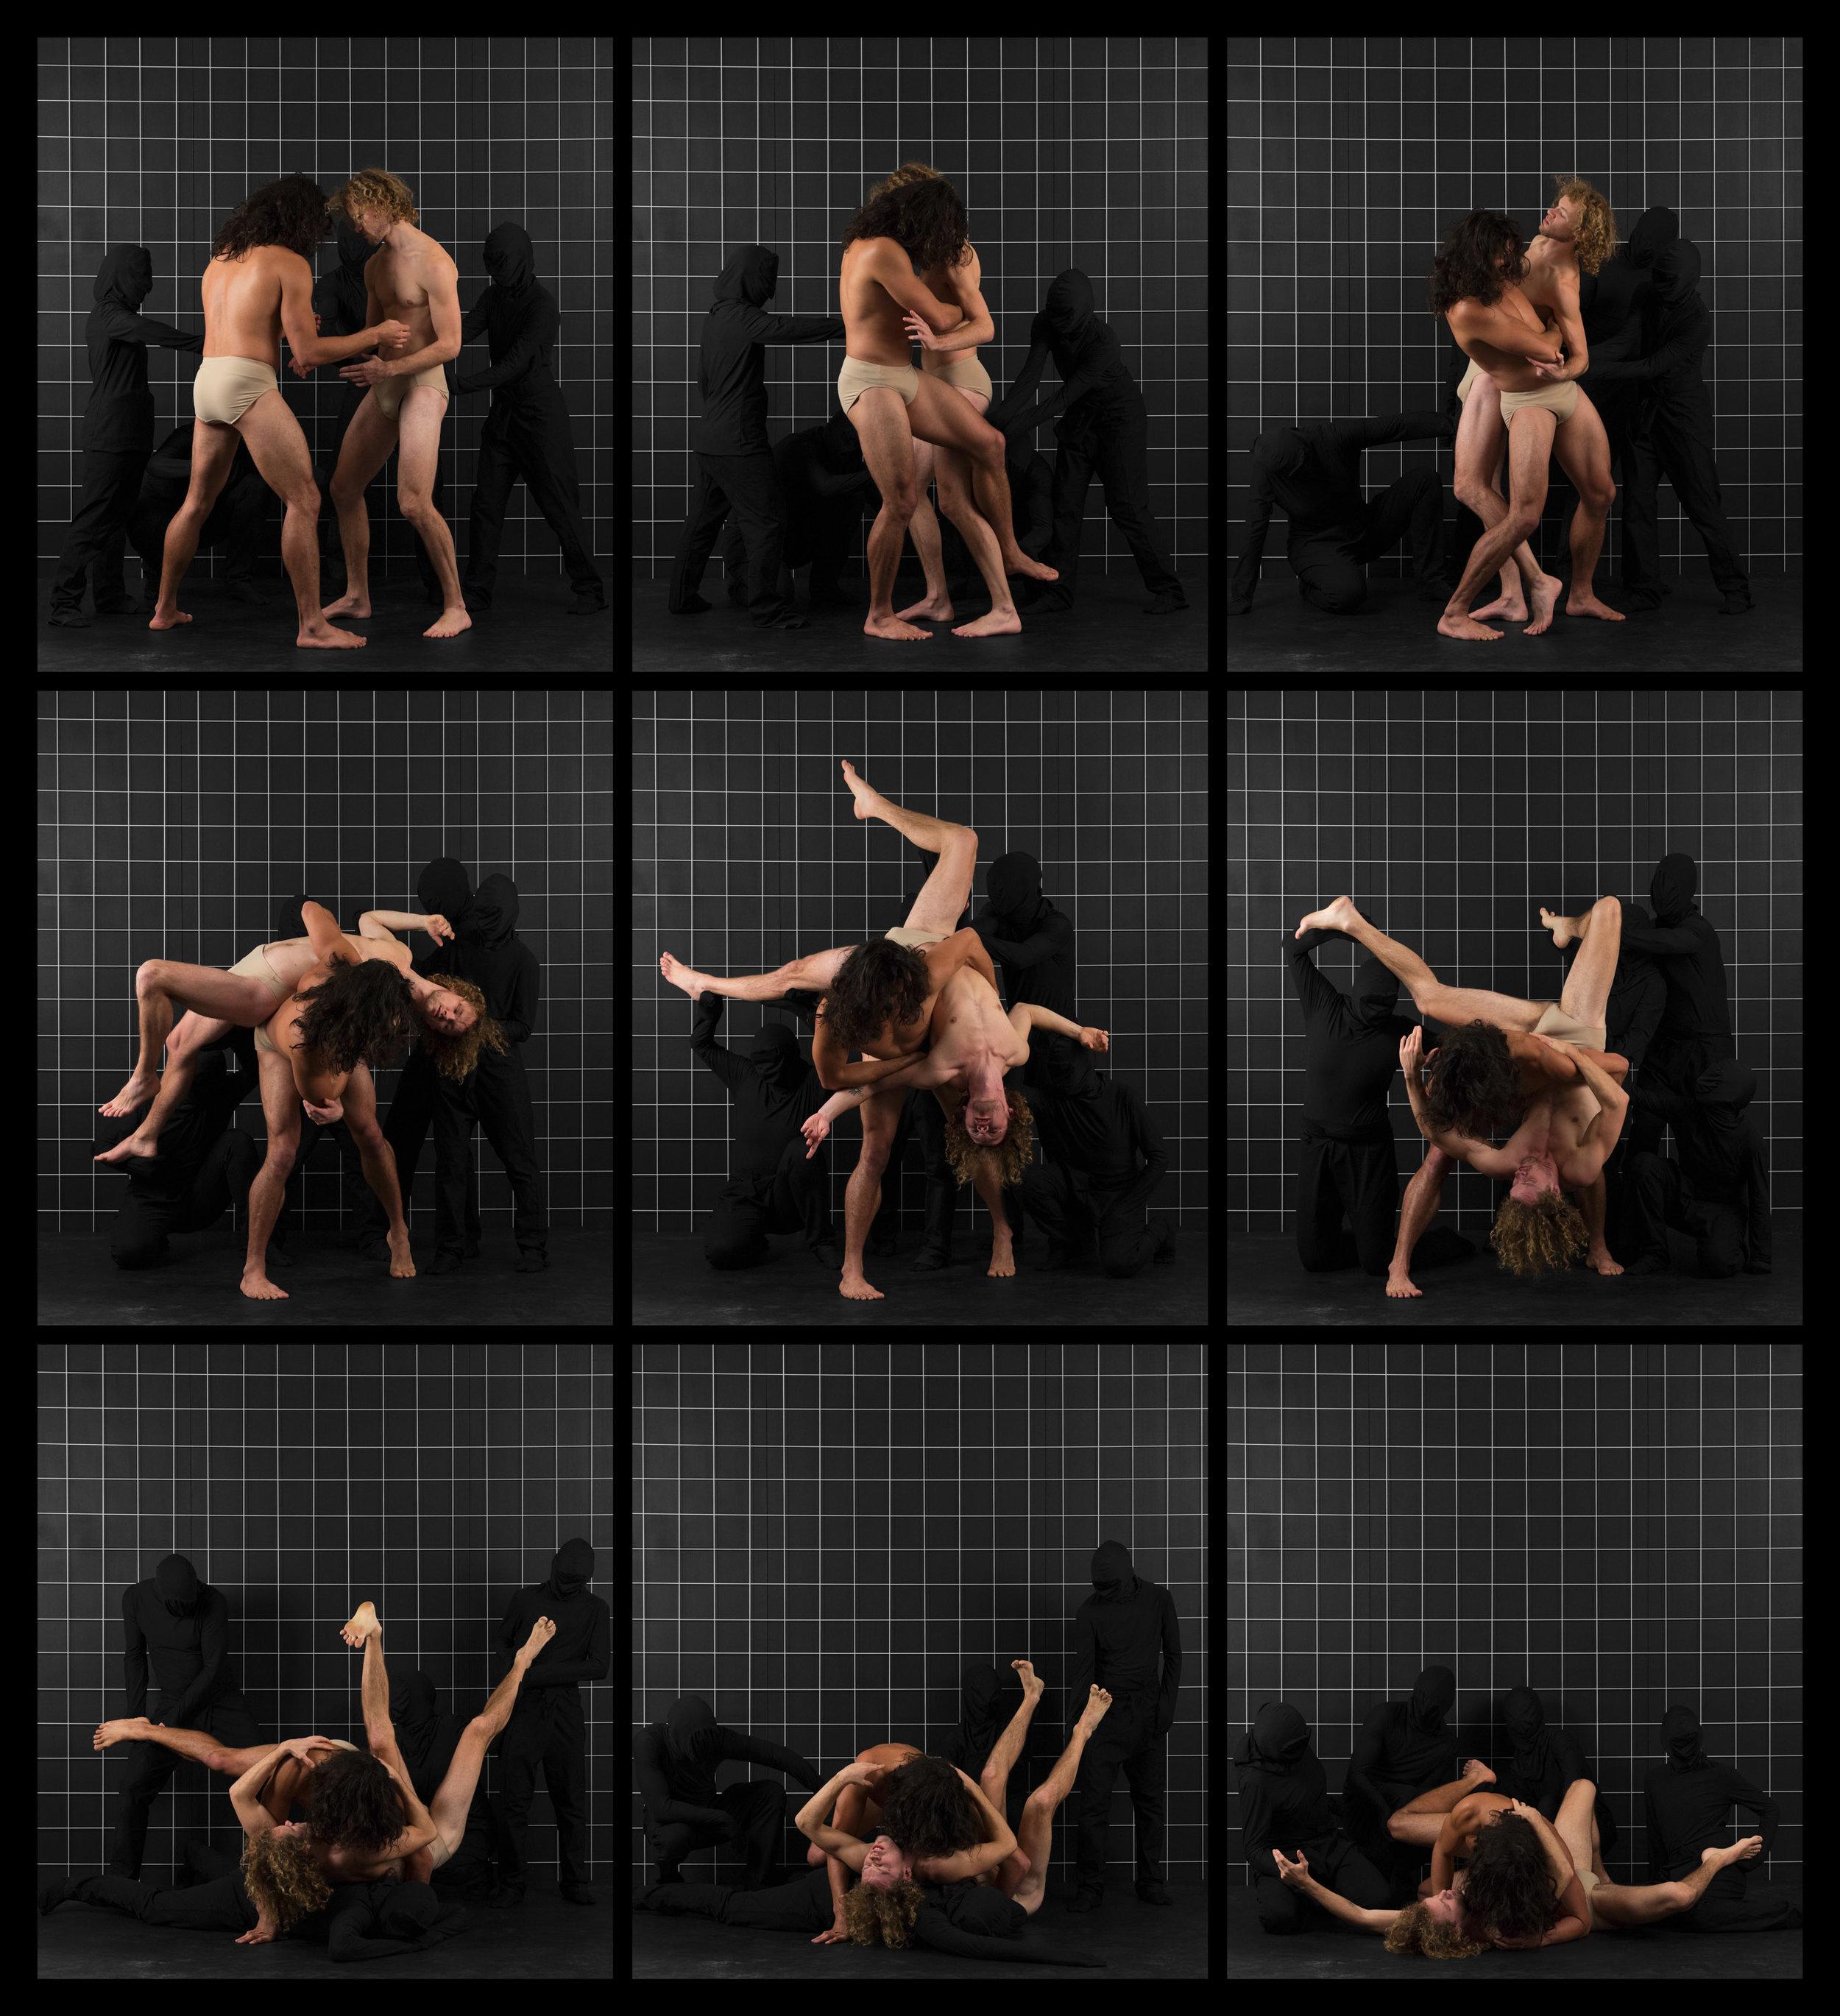 "After Muybridge (Wrestlers 2)  2016, archival pigment print 68.5 x 62 cm (27"" x 24.5"")  137 x 124.5 cm (54"" x 49"")  Editions of 2"